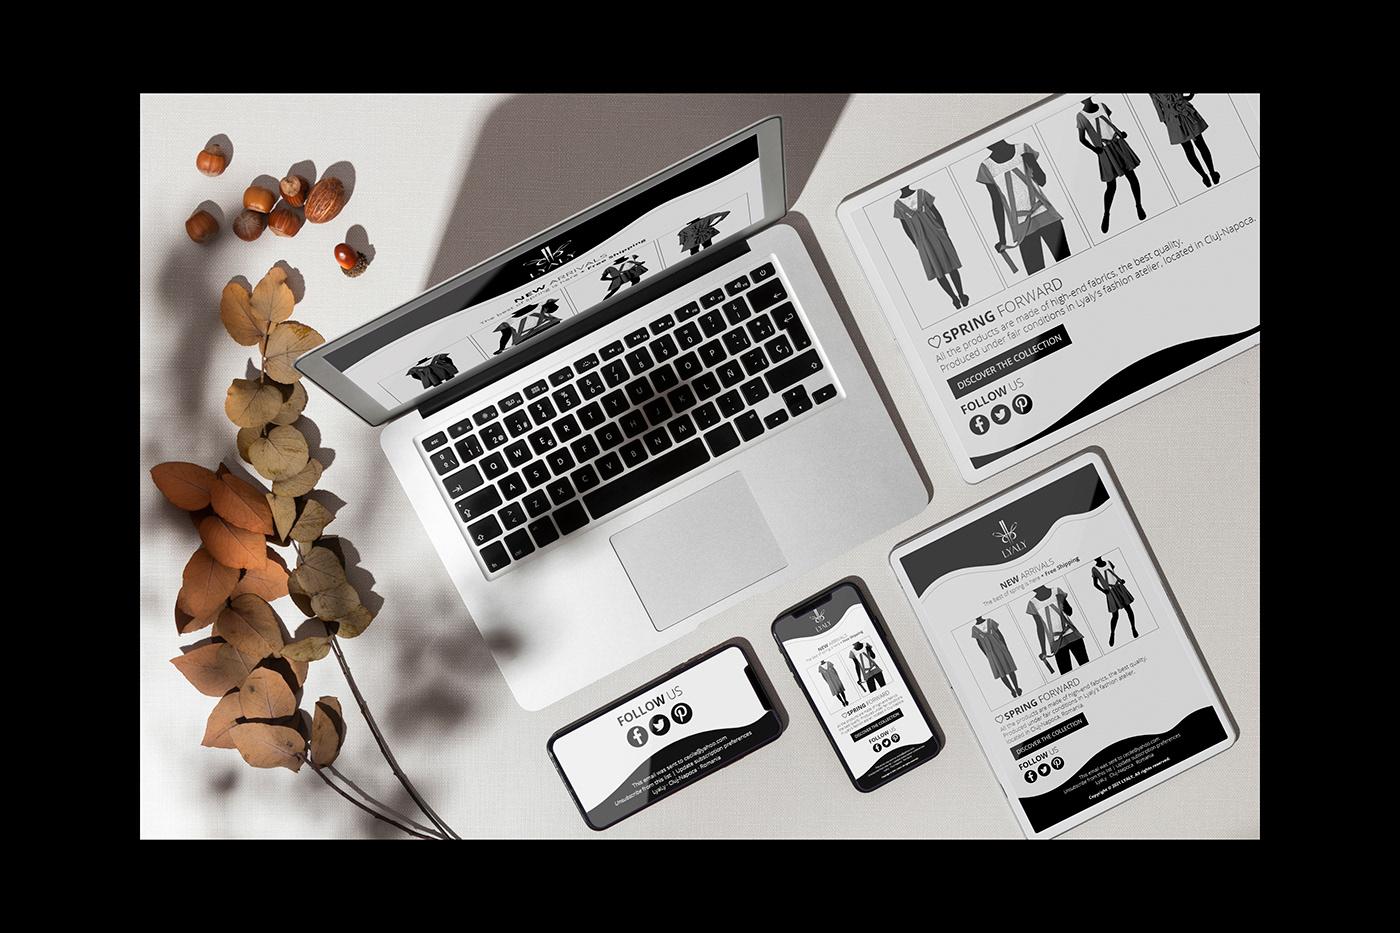 Adobe XD Email Design email newsletter Email Templates Fashion  graphic design  marketing   newsletter ui design Web Design